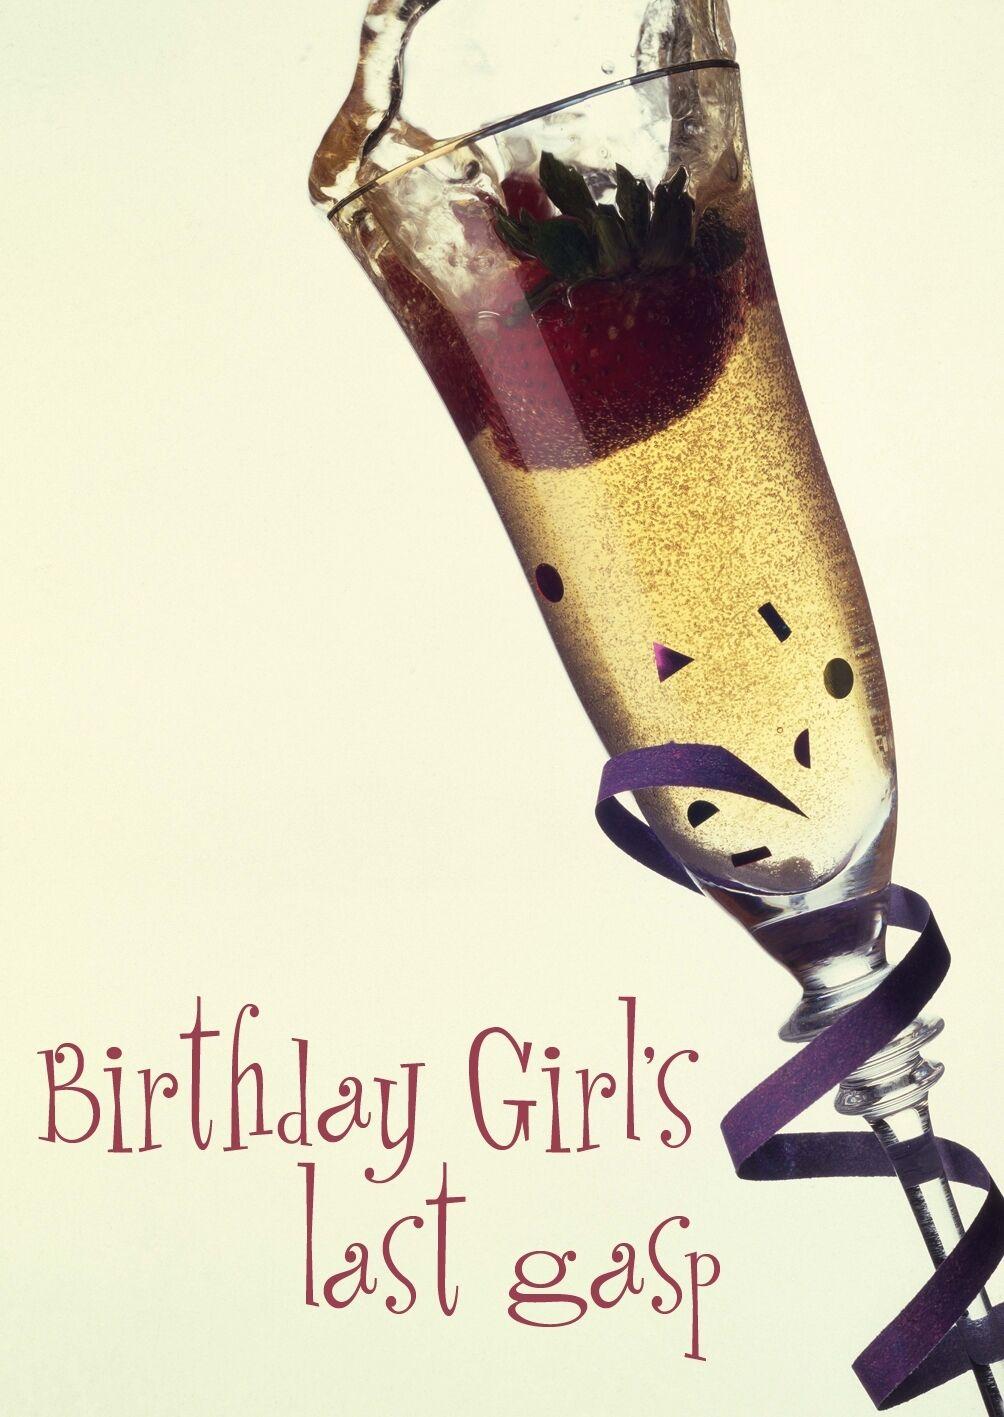 Birthday Girl's Last Gasp - 6, 8, 10, 12  player games - ALL GIRL